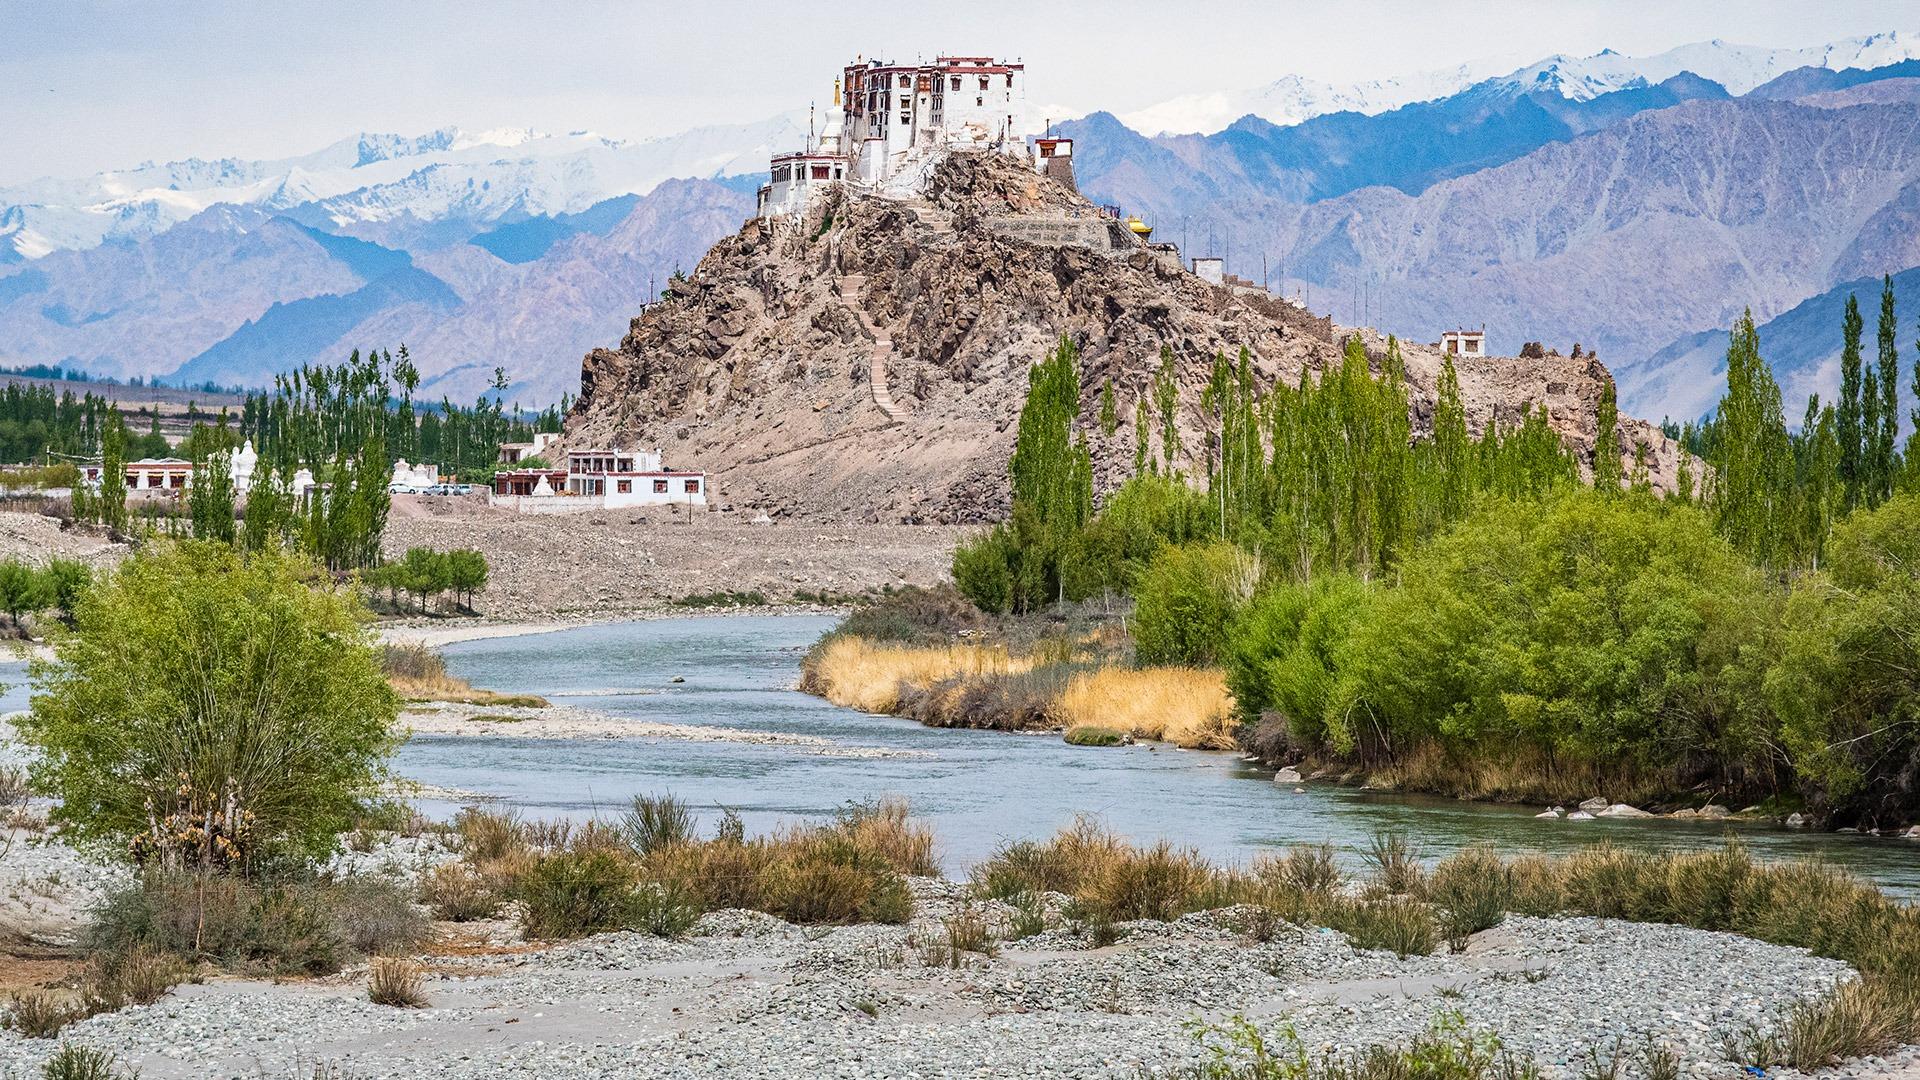 Stakna Monastery in Ladakh, India